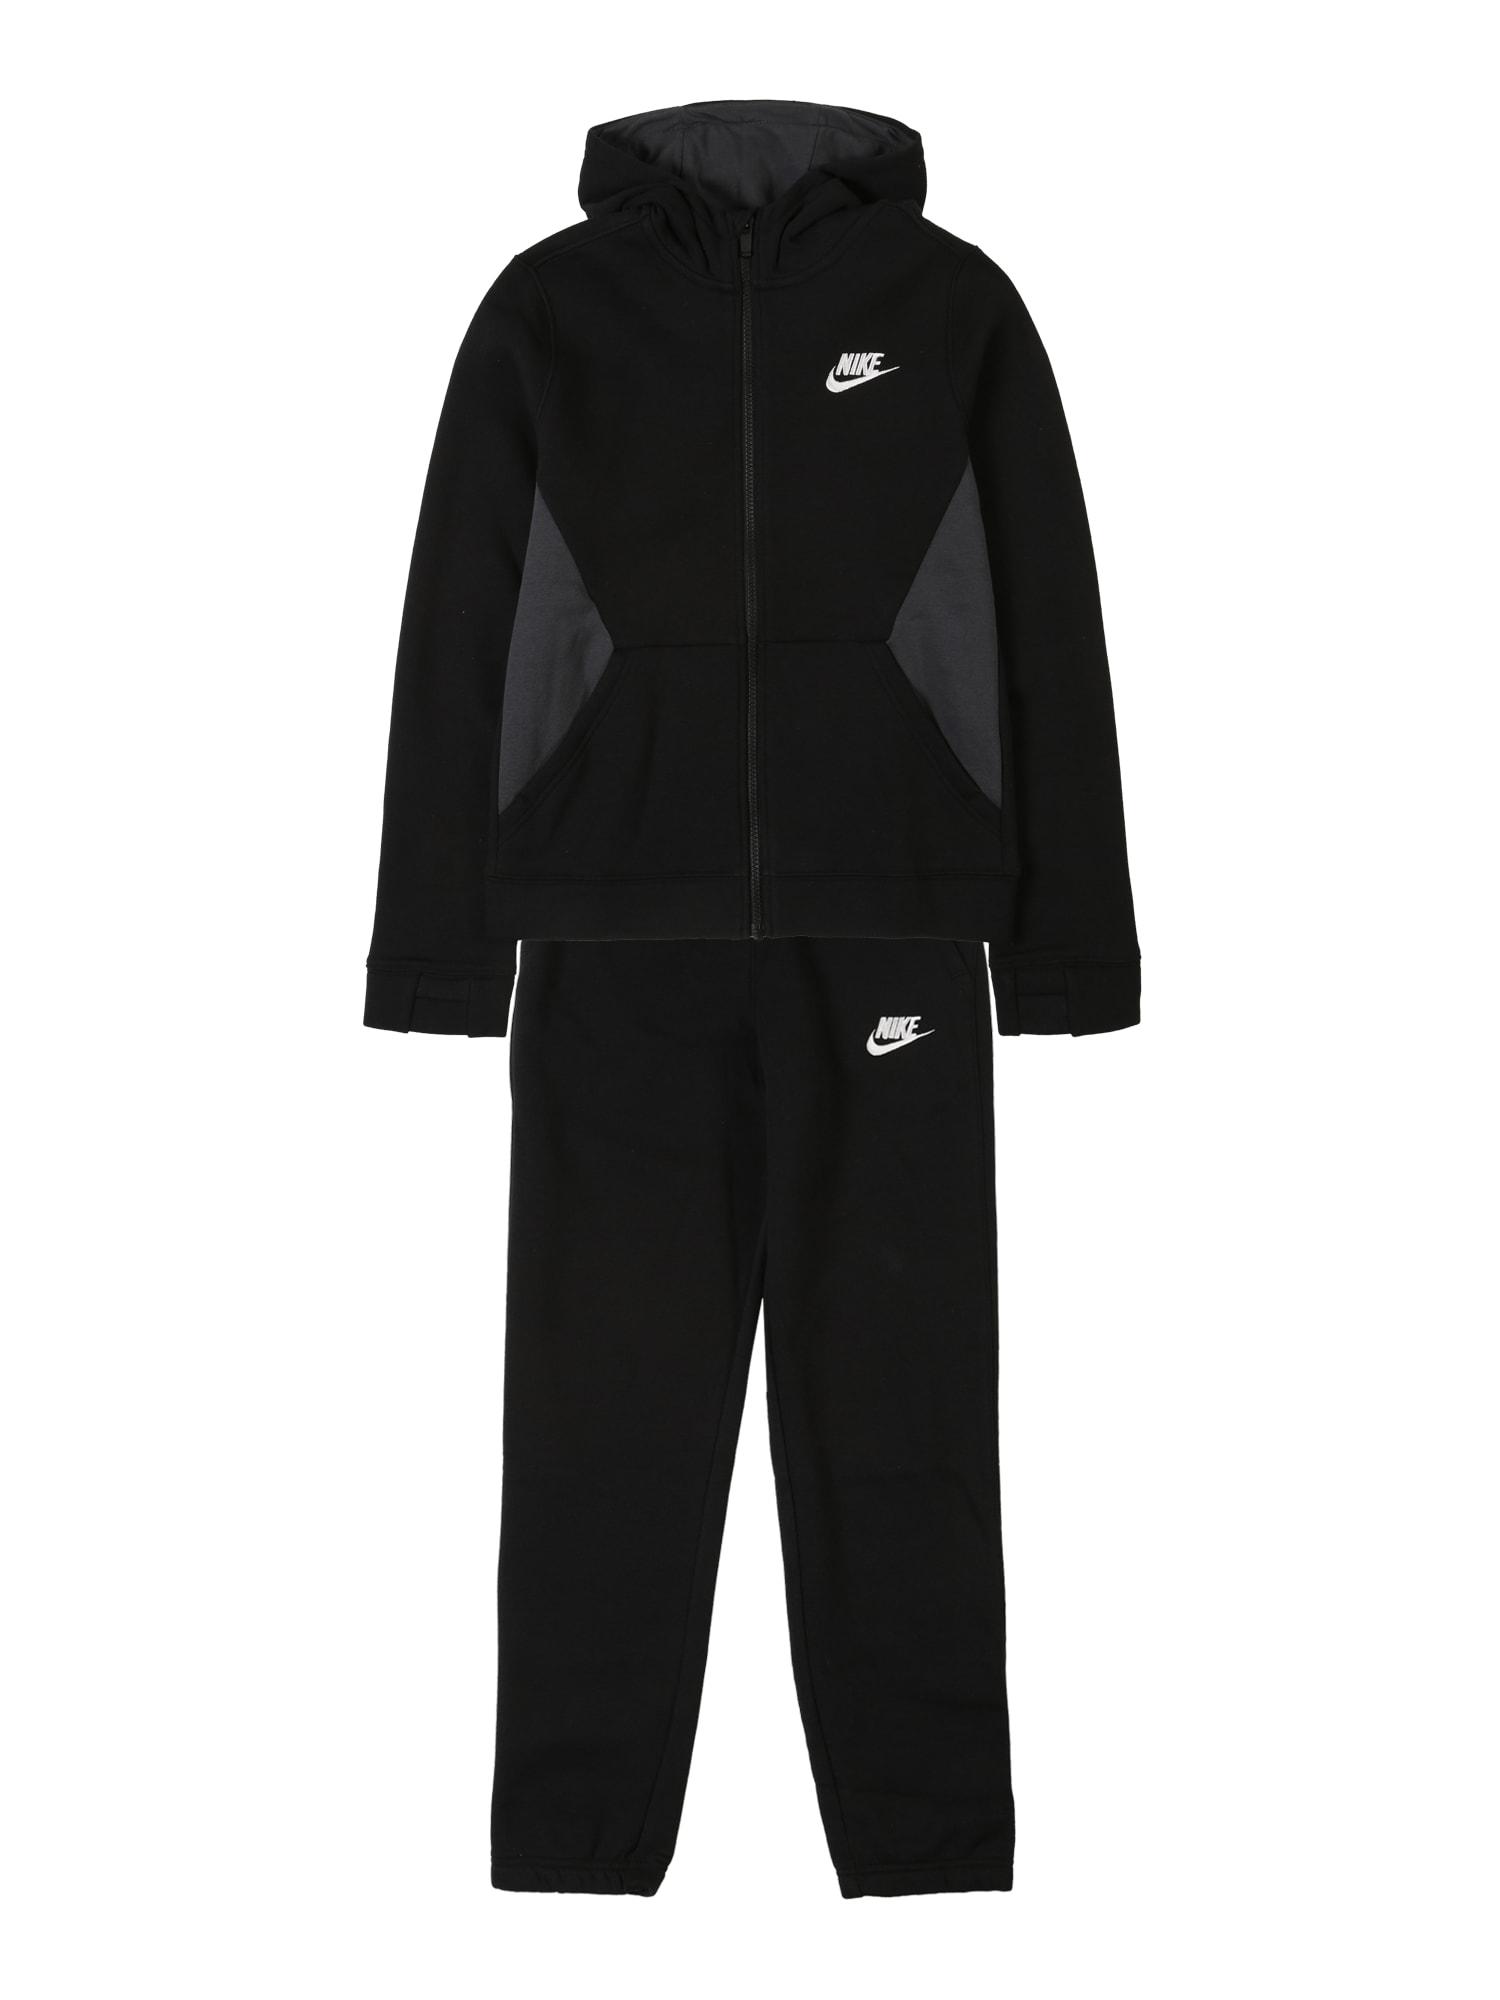 Nike Sportswear Joggingová súprava 'Nike Sportswear'  čierna